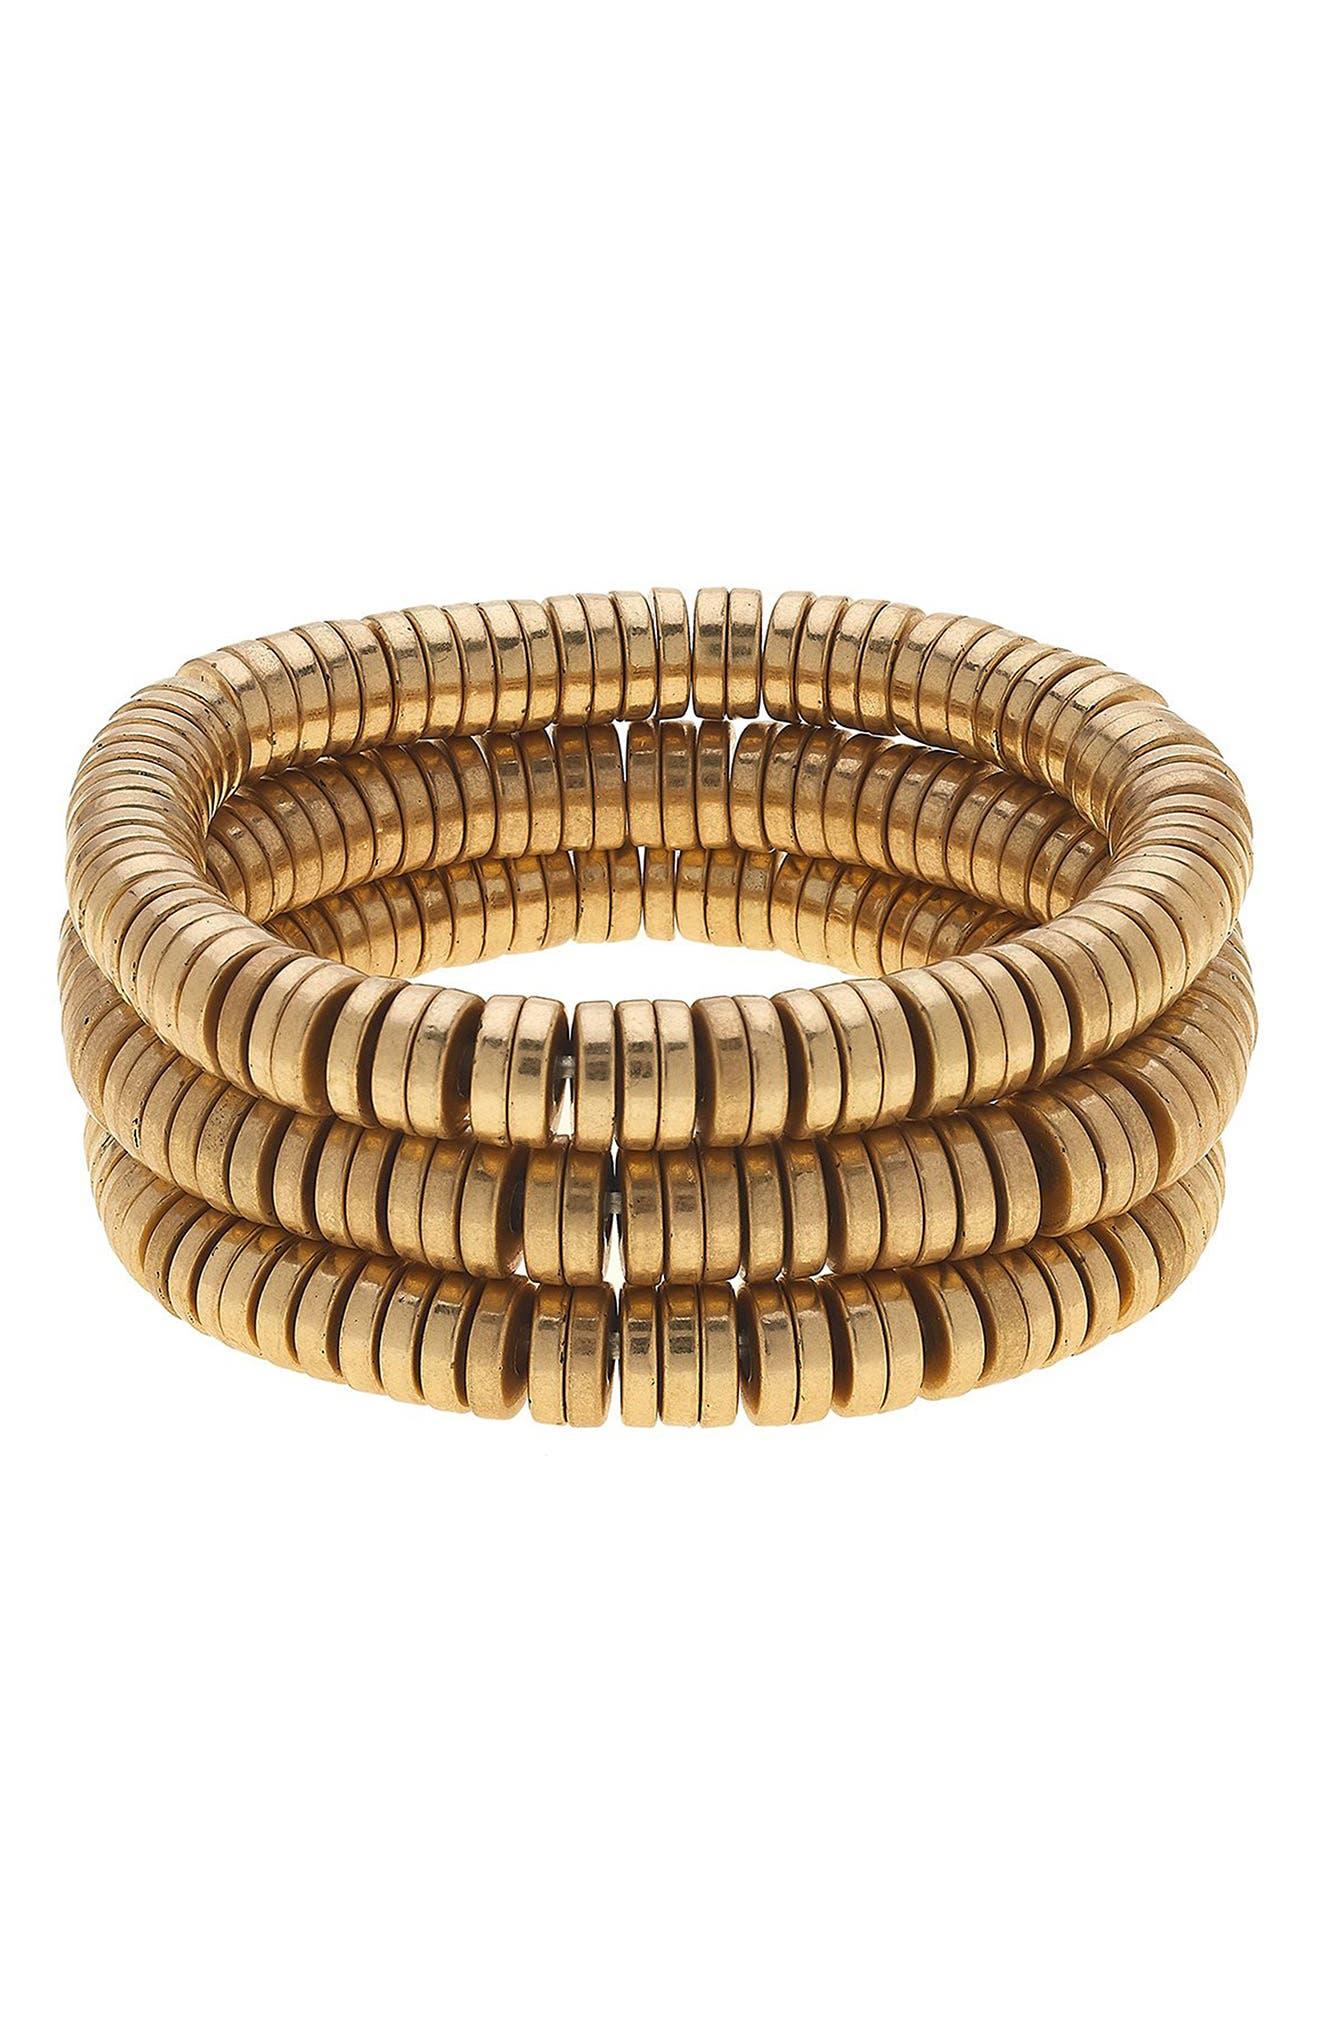 Emberly Set Of 3 Stacking Bracelets